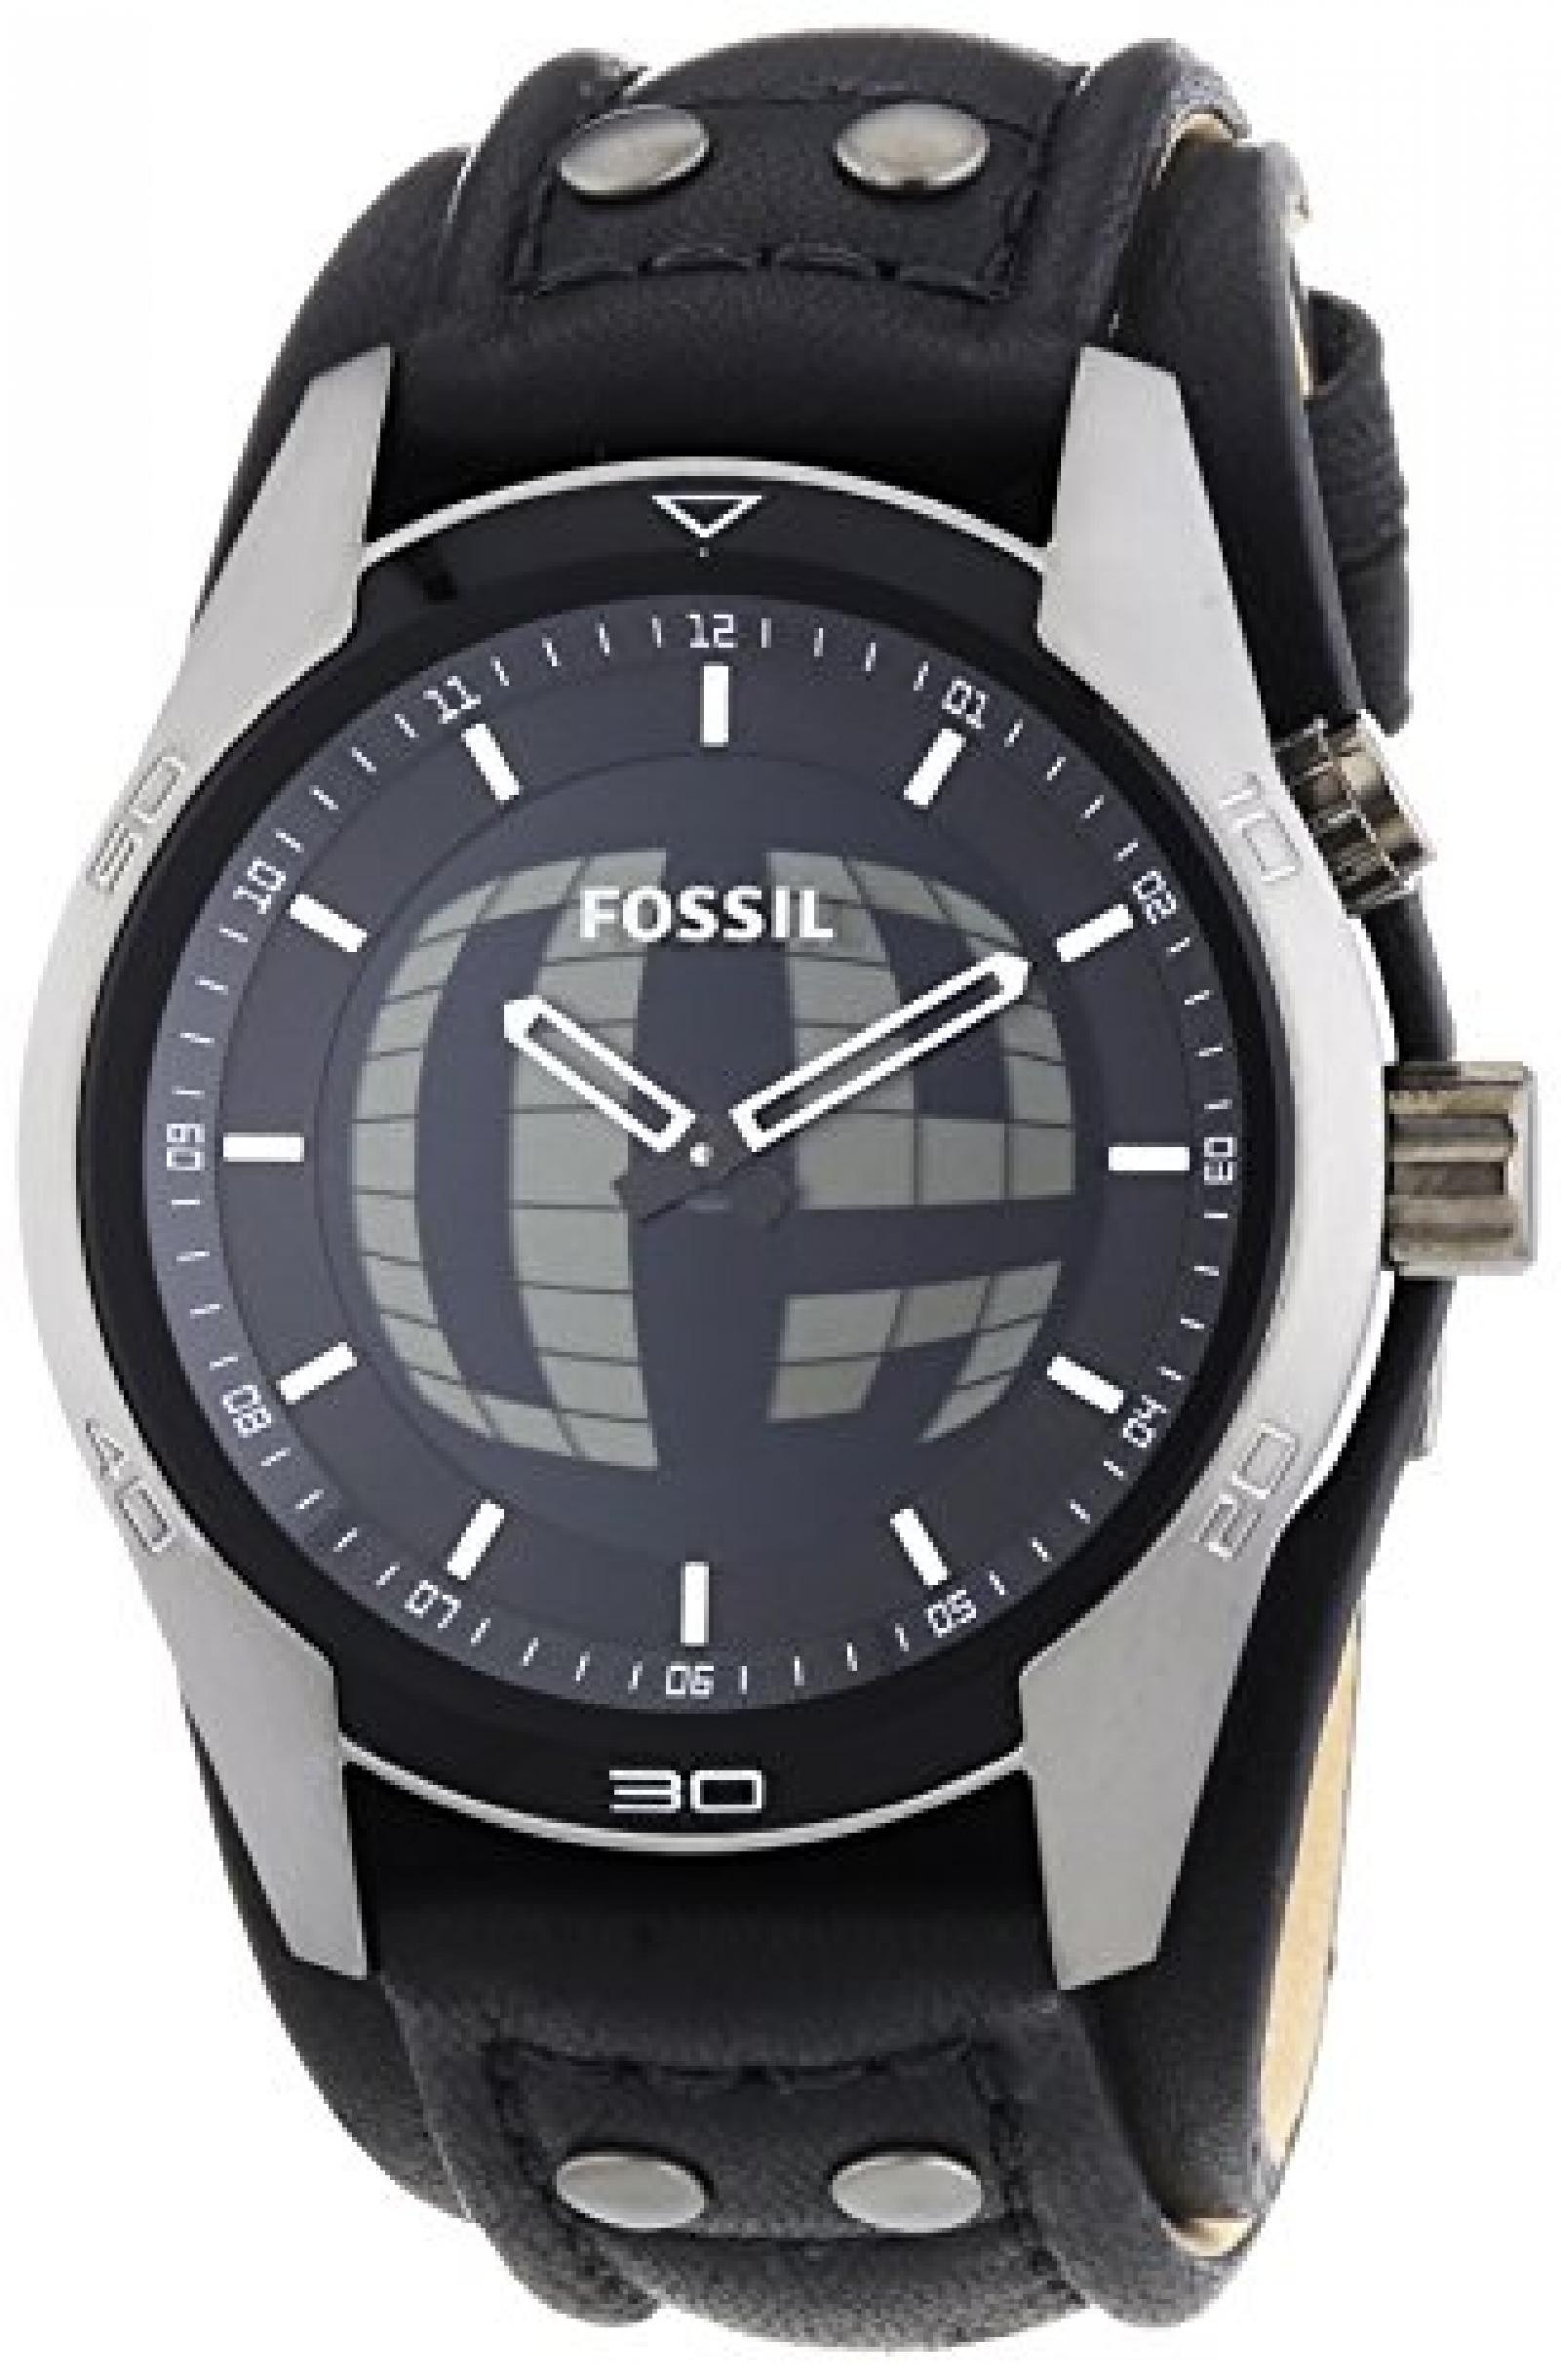 Fossil Herren-Armbanduhr XL Coachman Analog - Digital Quarz Leder JR1472